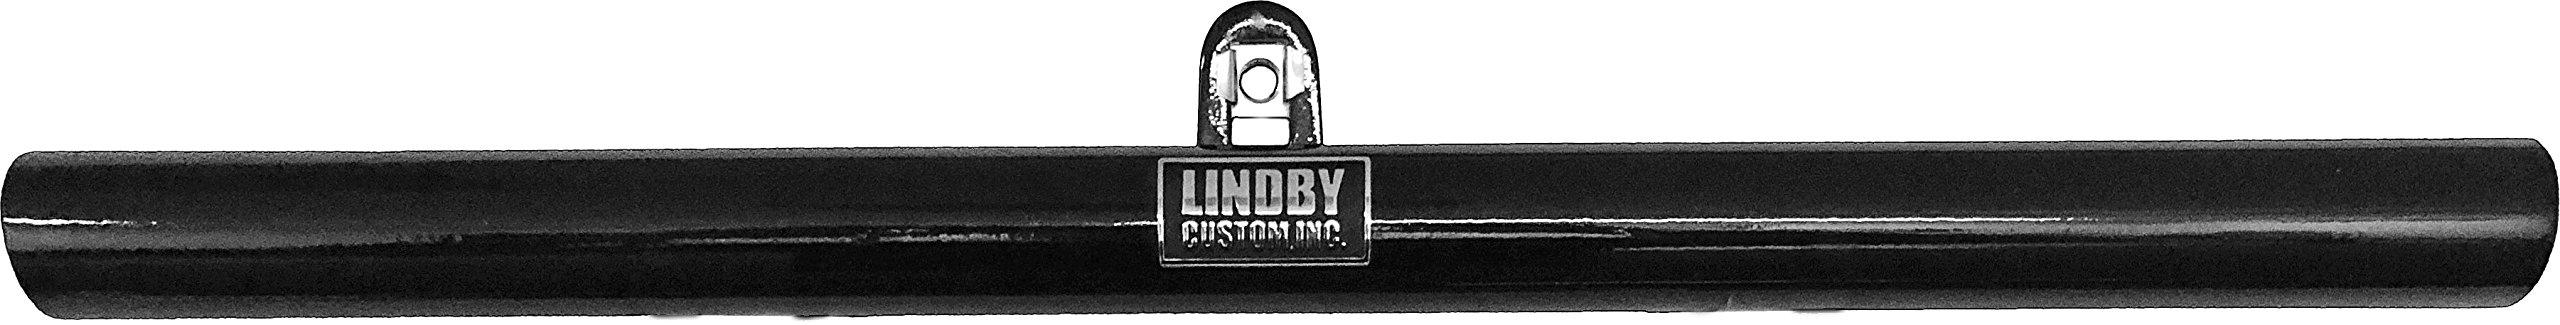 Lindby Custom Fairing Support Bar BL 1609